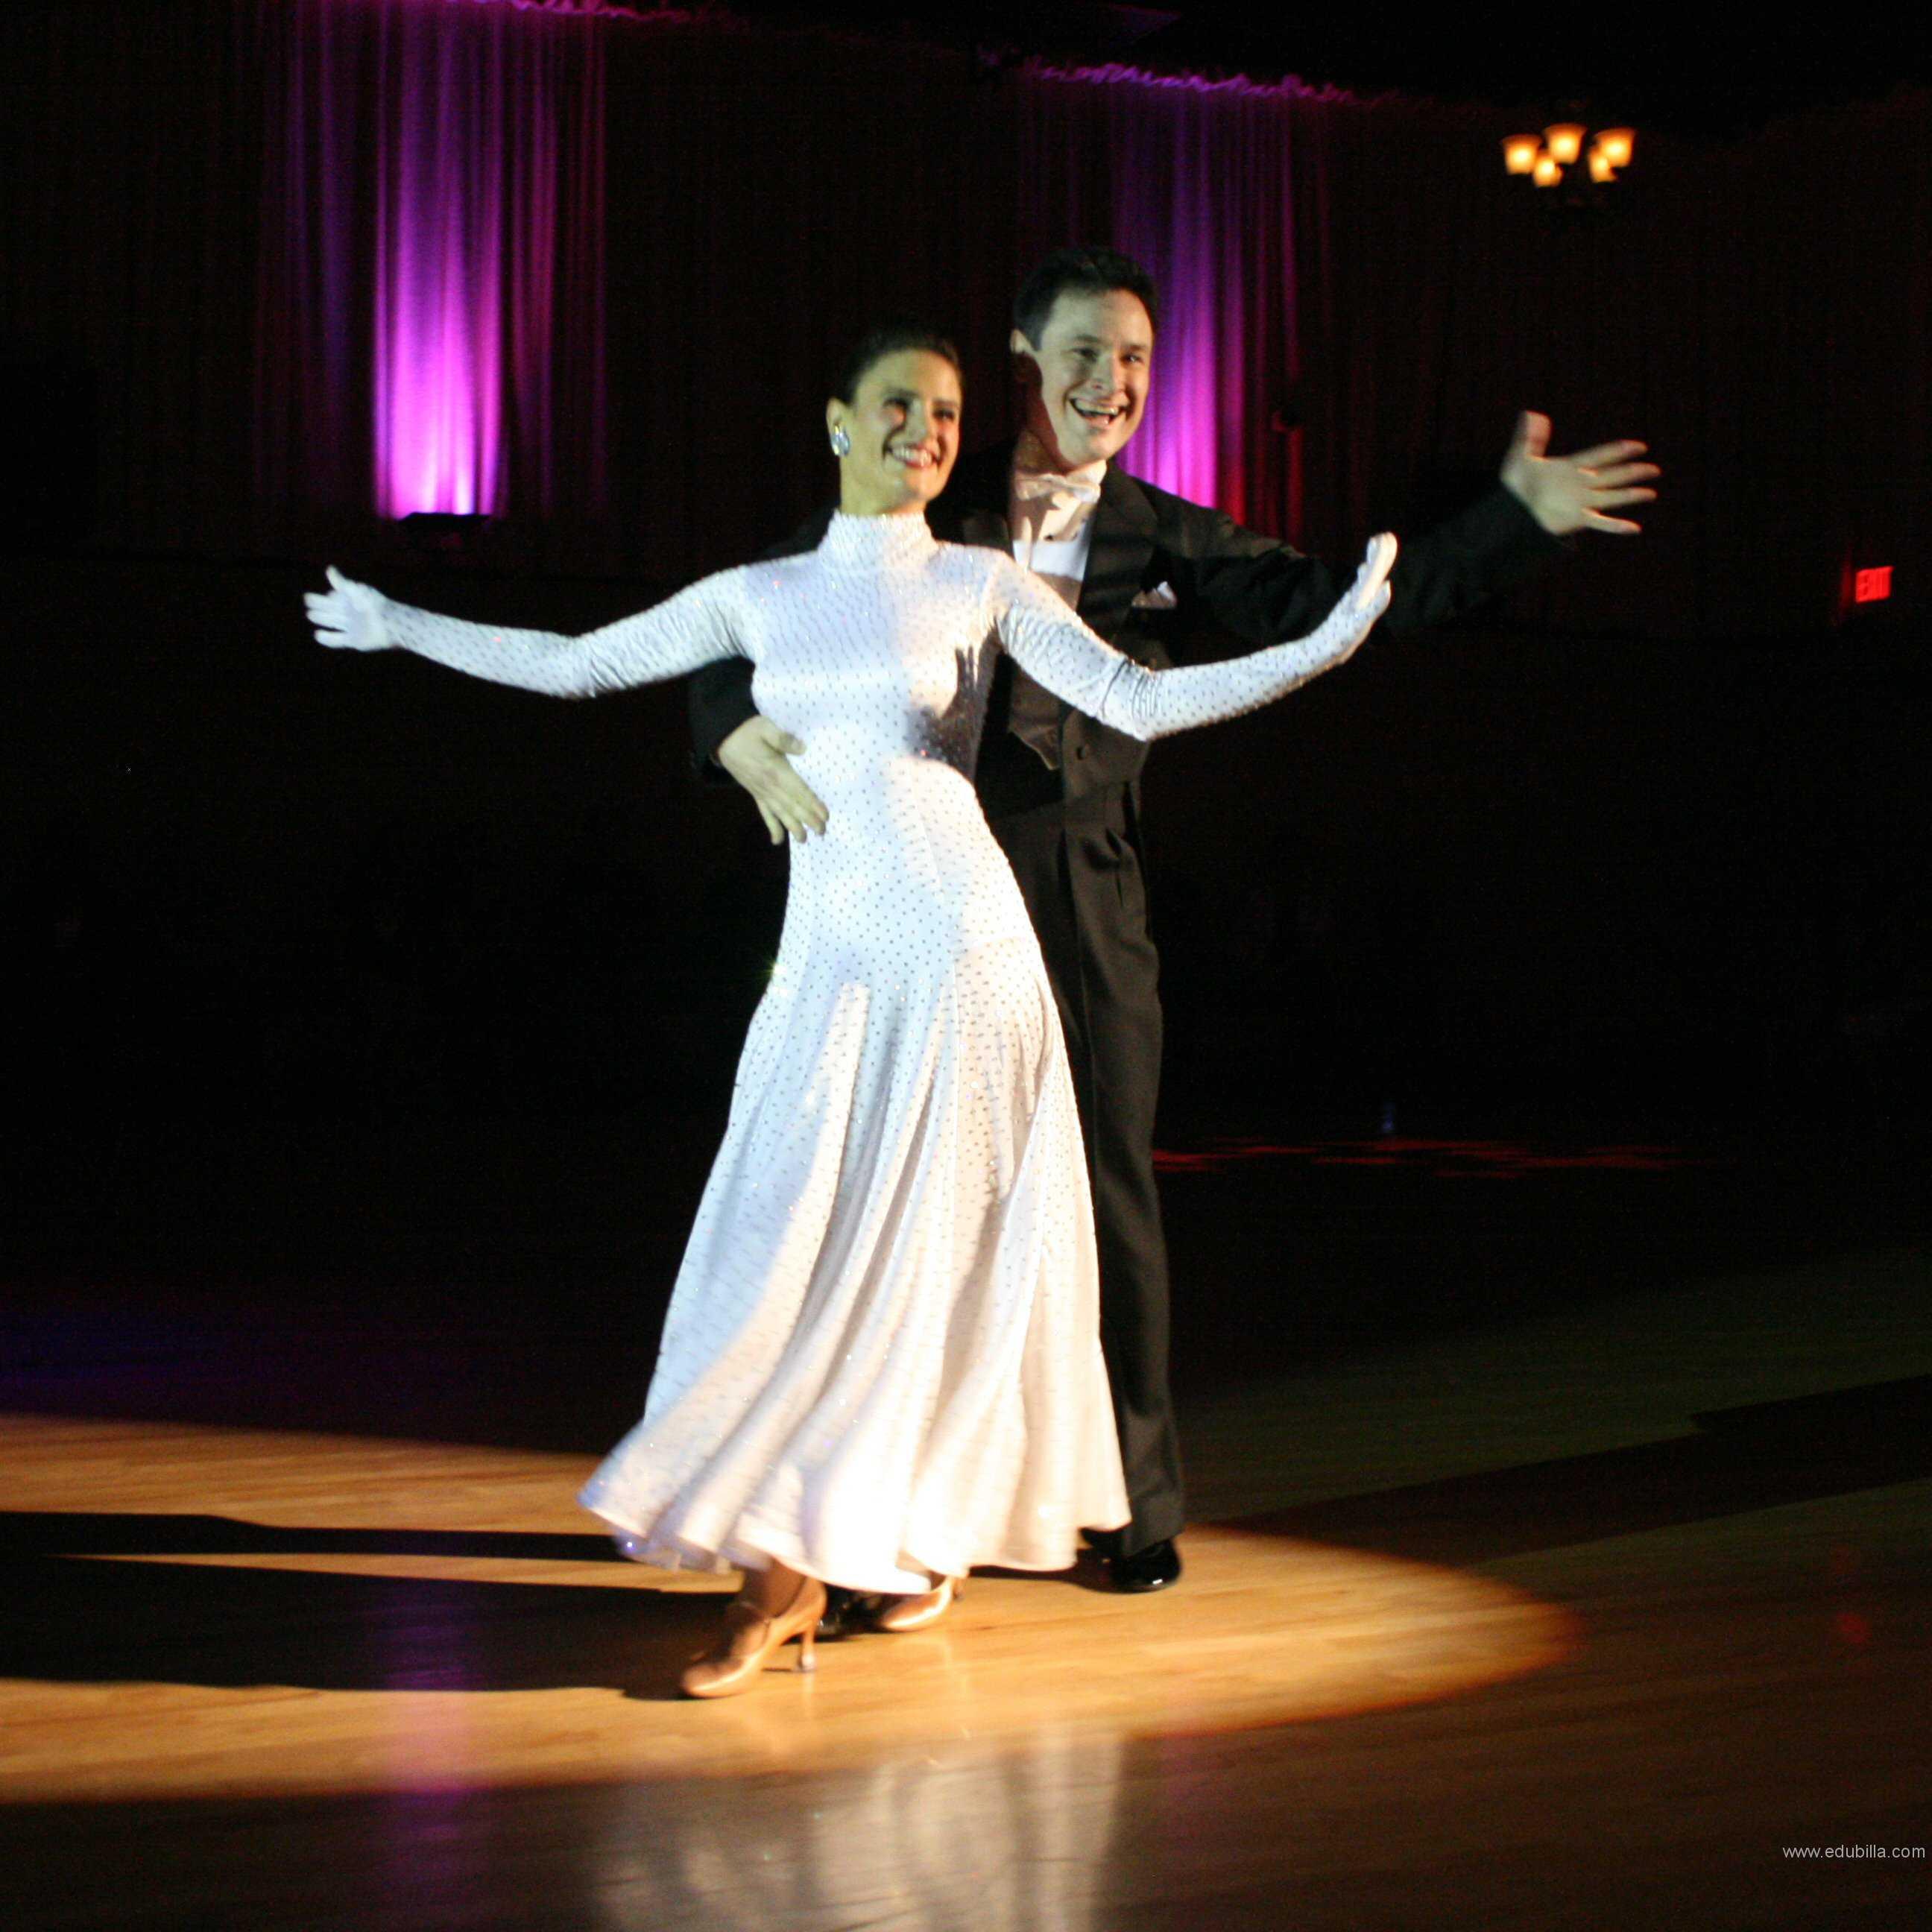 ballroomdance7.jpg